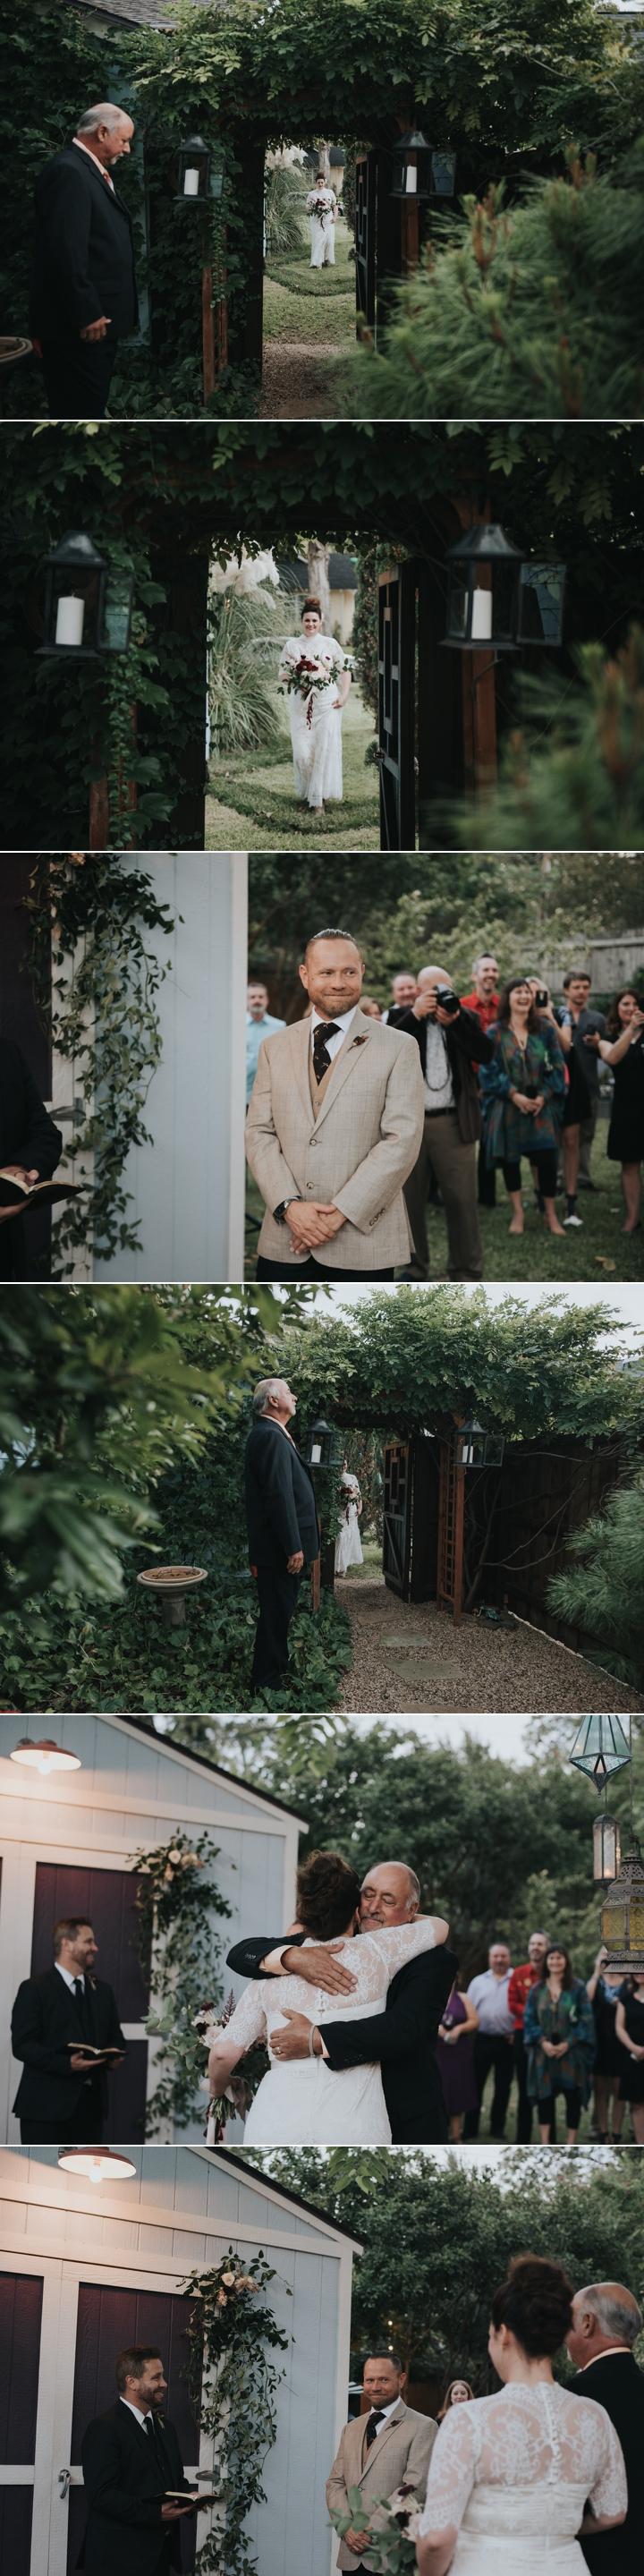 dallas-wedding-photographers-jp 24.jpg